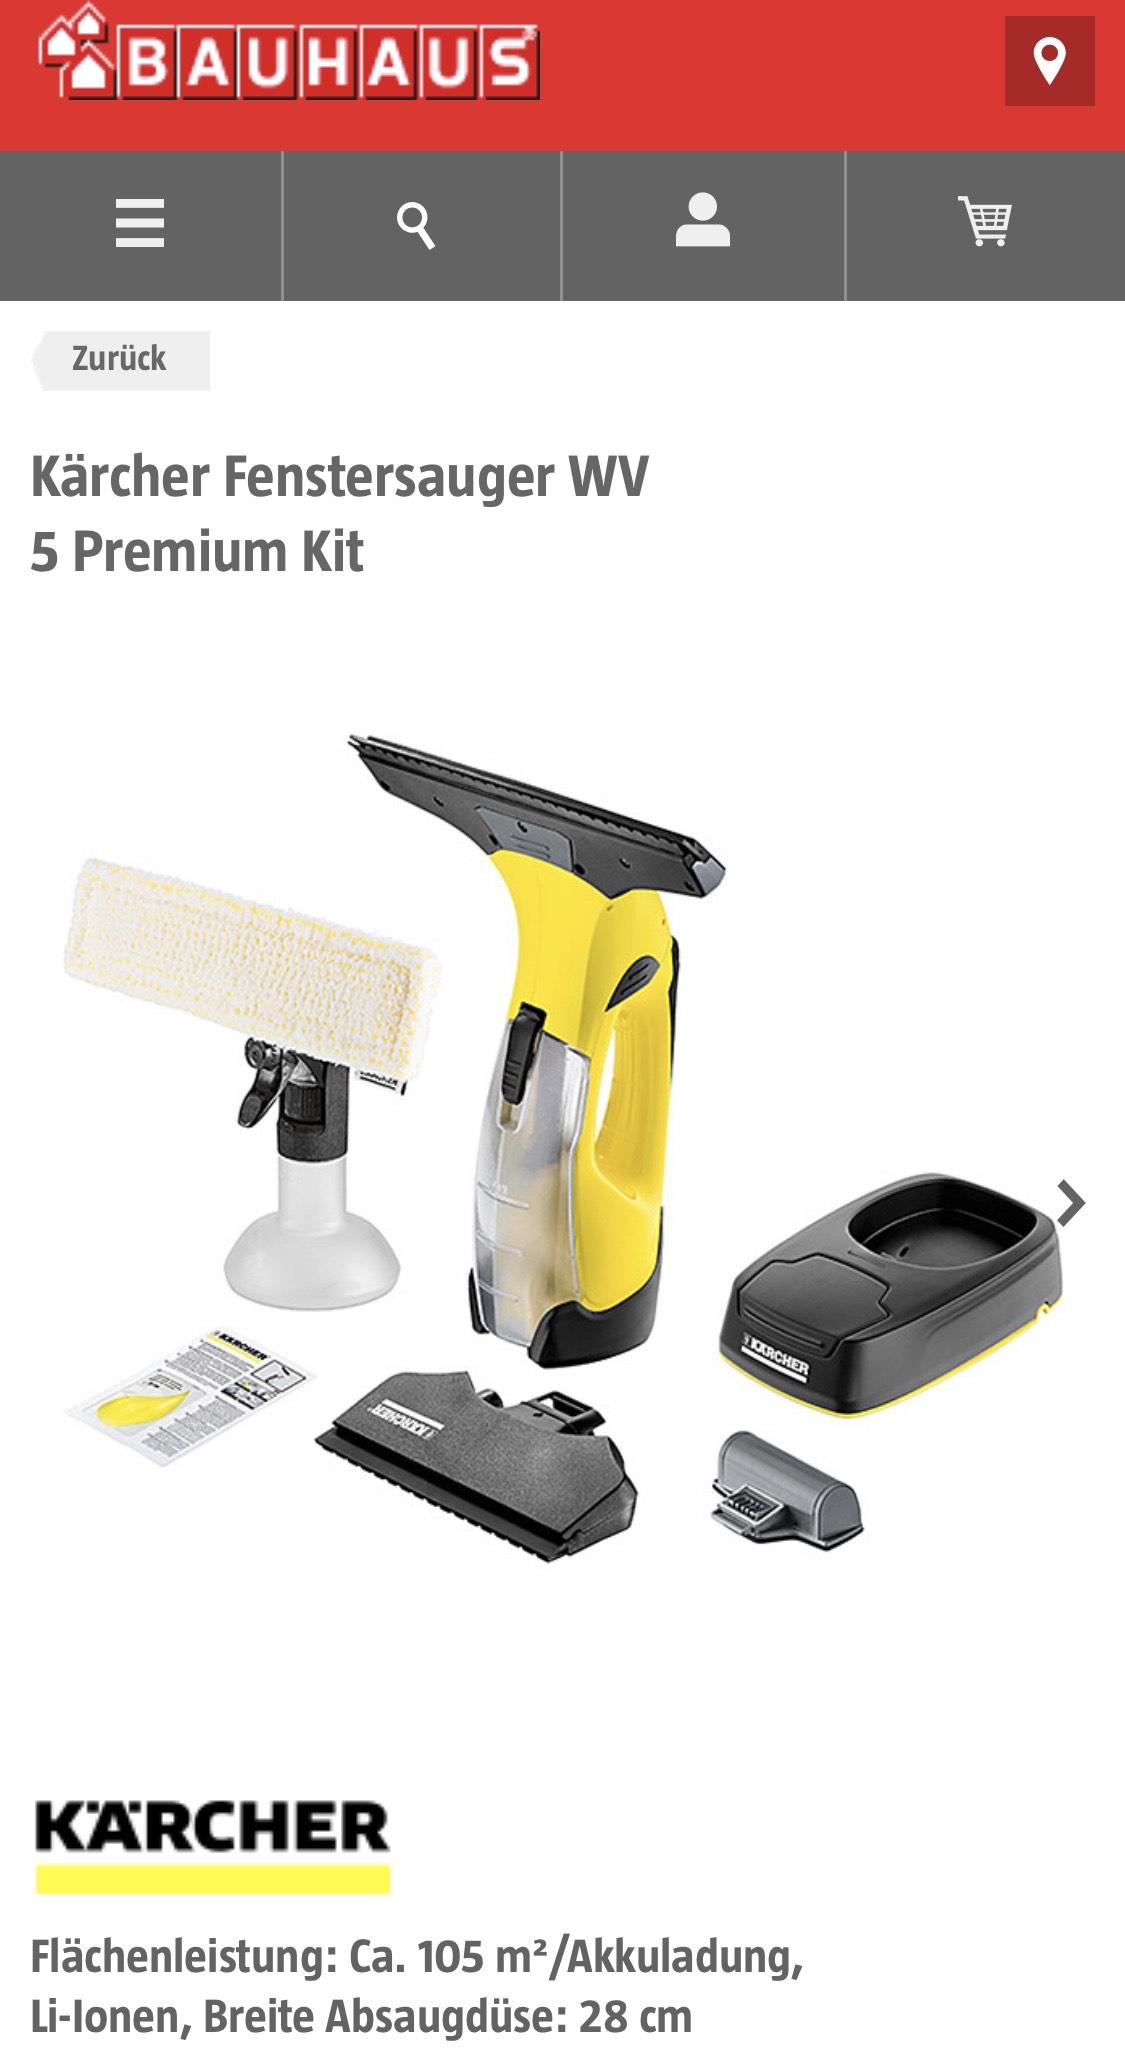 Fenstersauger Kärcher Fenstersauger WV 5 Premium Kit